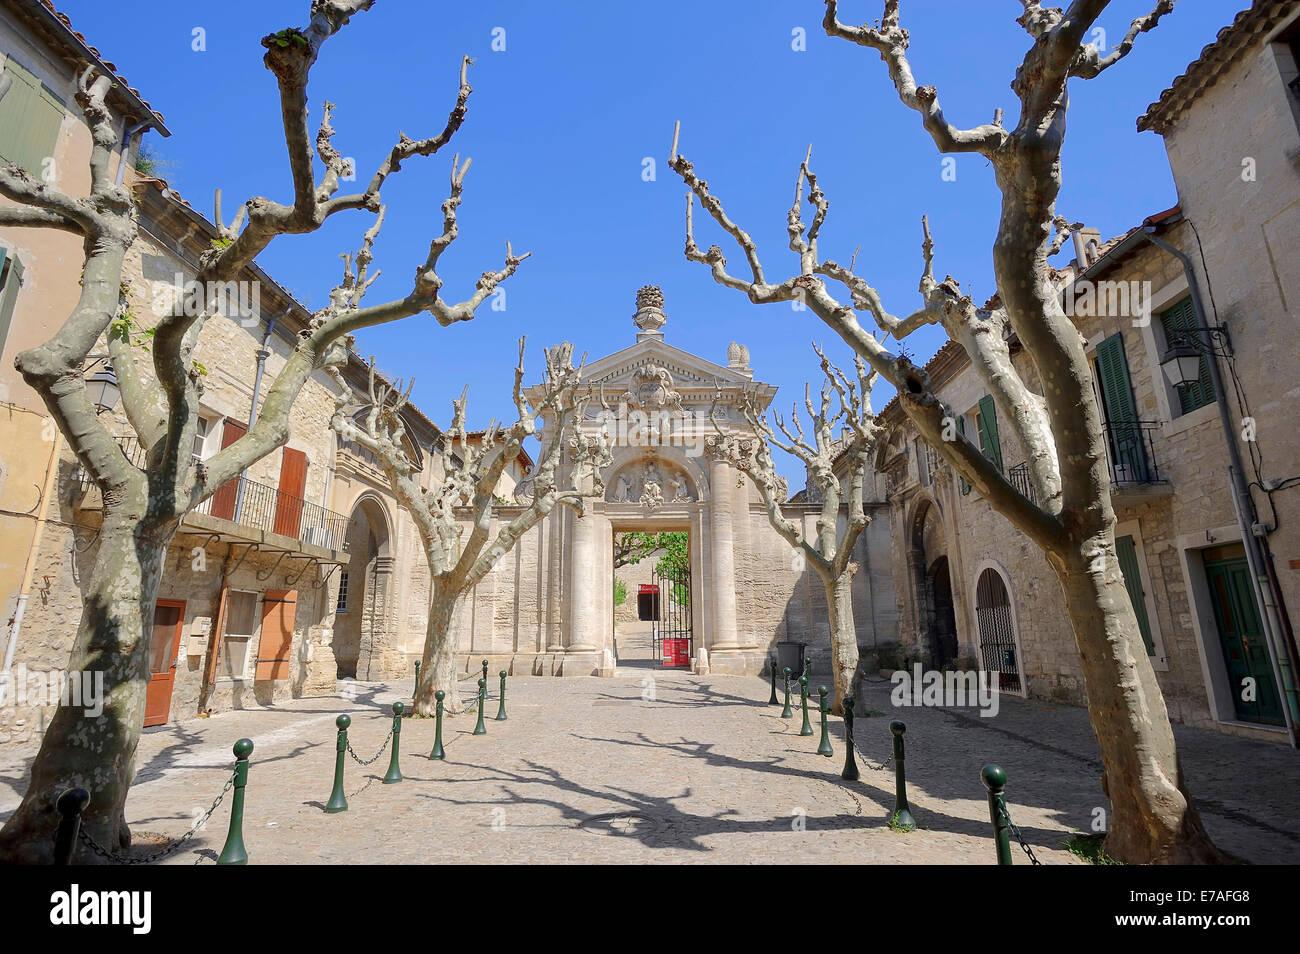 Gate of the Carthusian monastery Chartreuse du Val de Benediction, Villeneuve-lès-Avignon, Gard, Languedoc - Stock Image